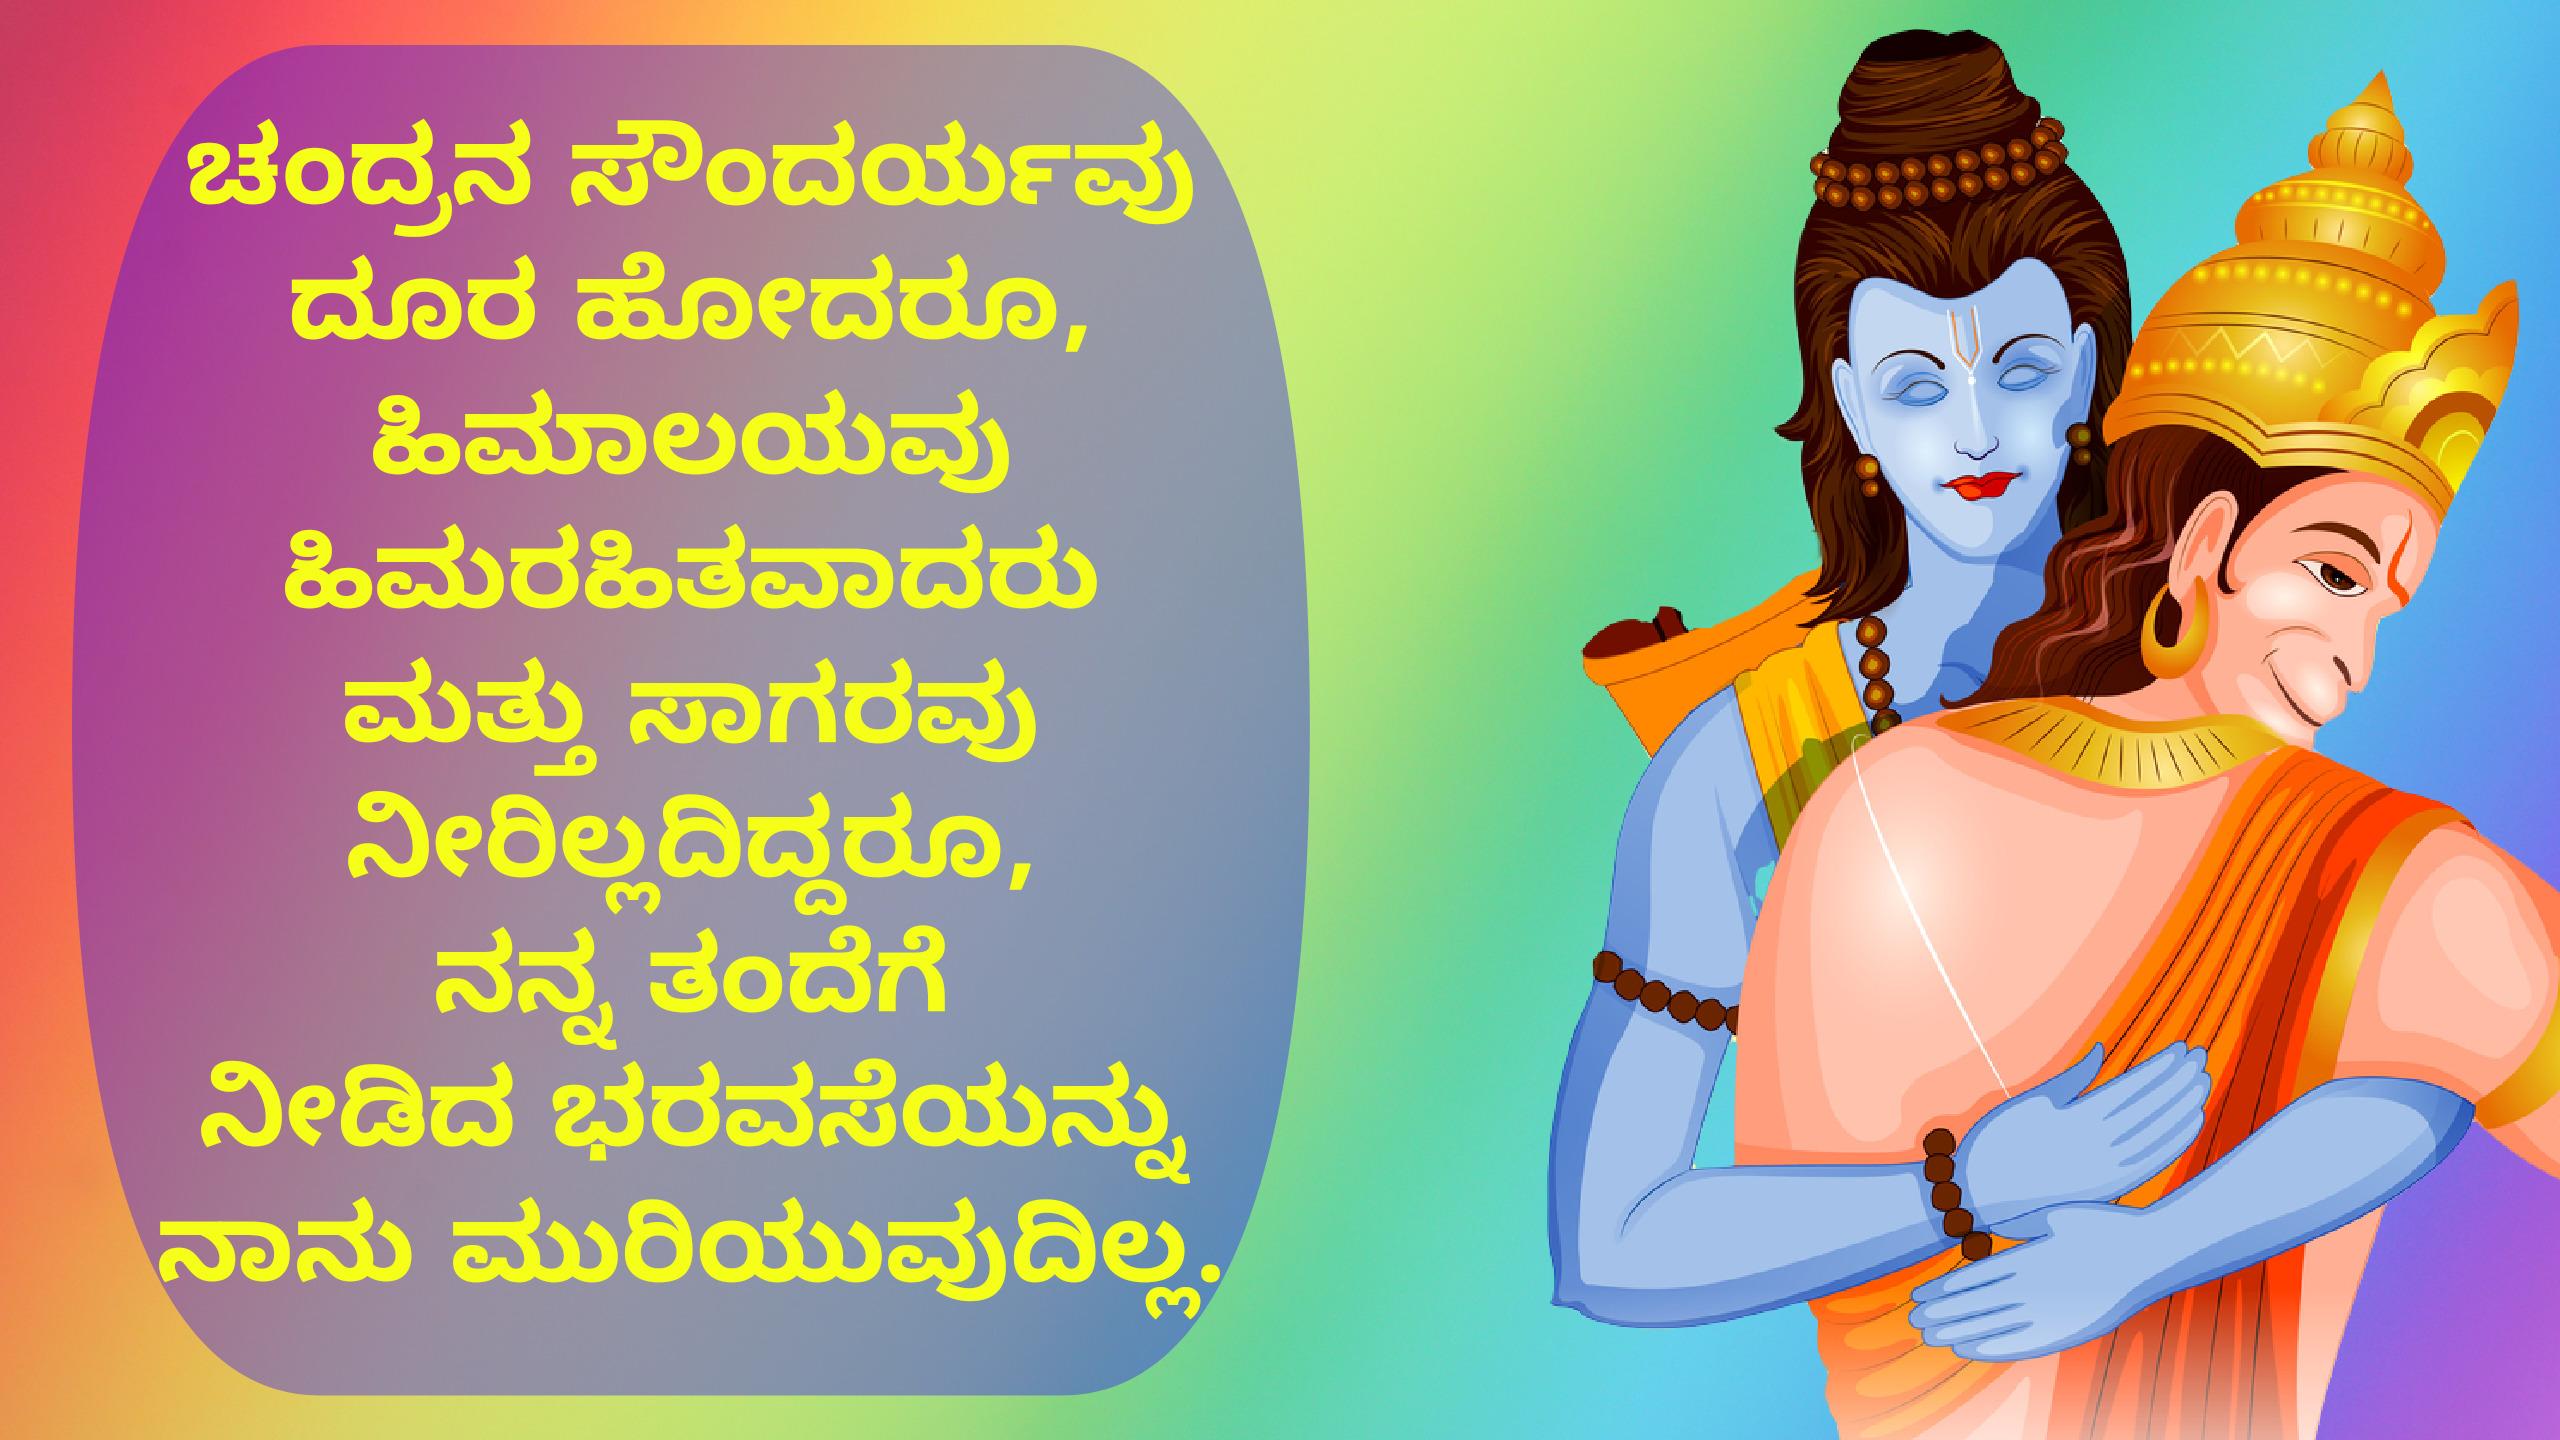 7. Shree Ram Quotes in Kannada